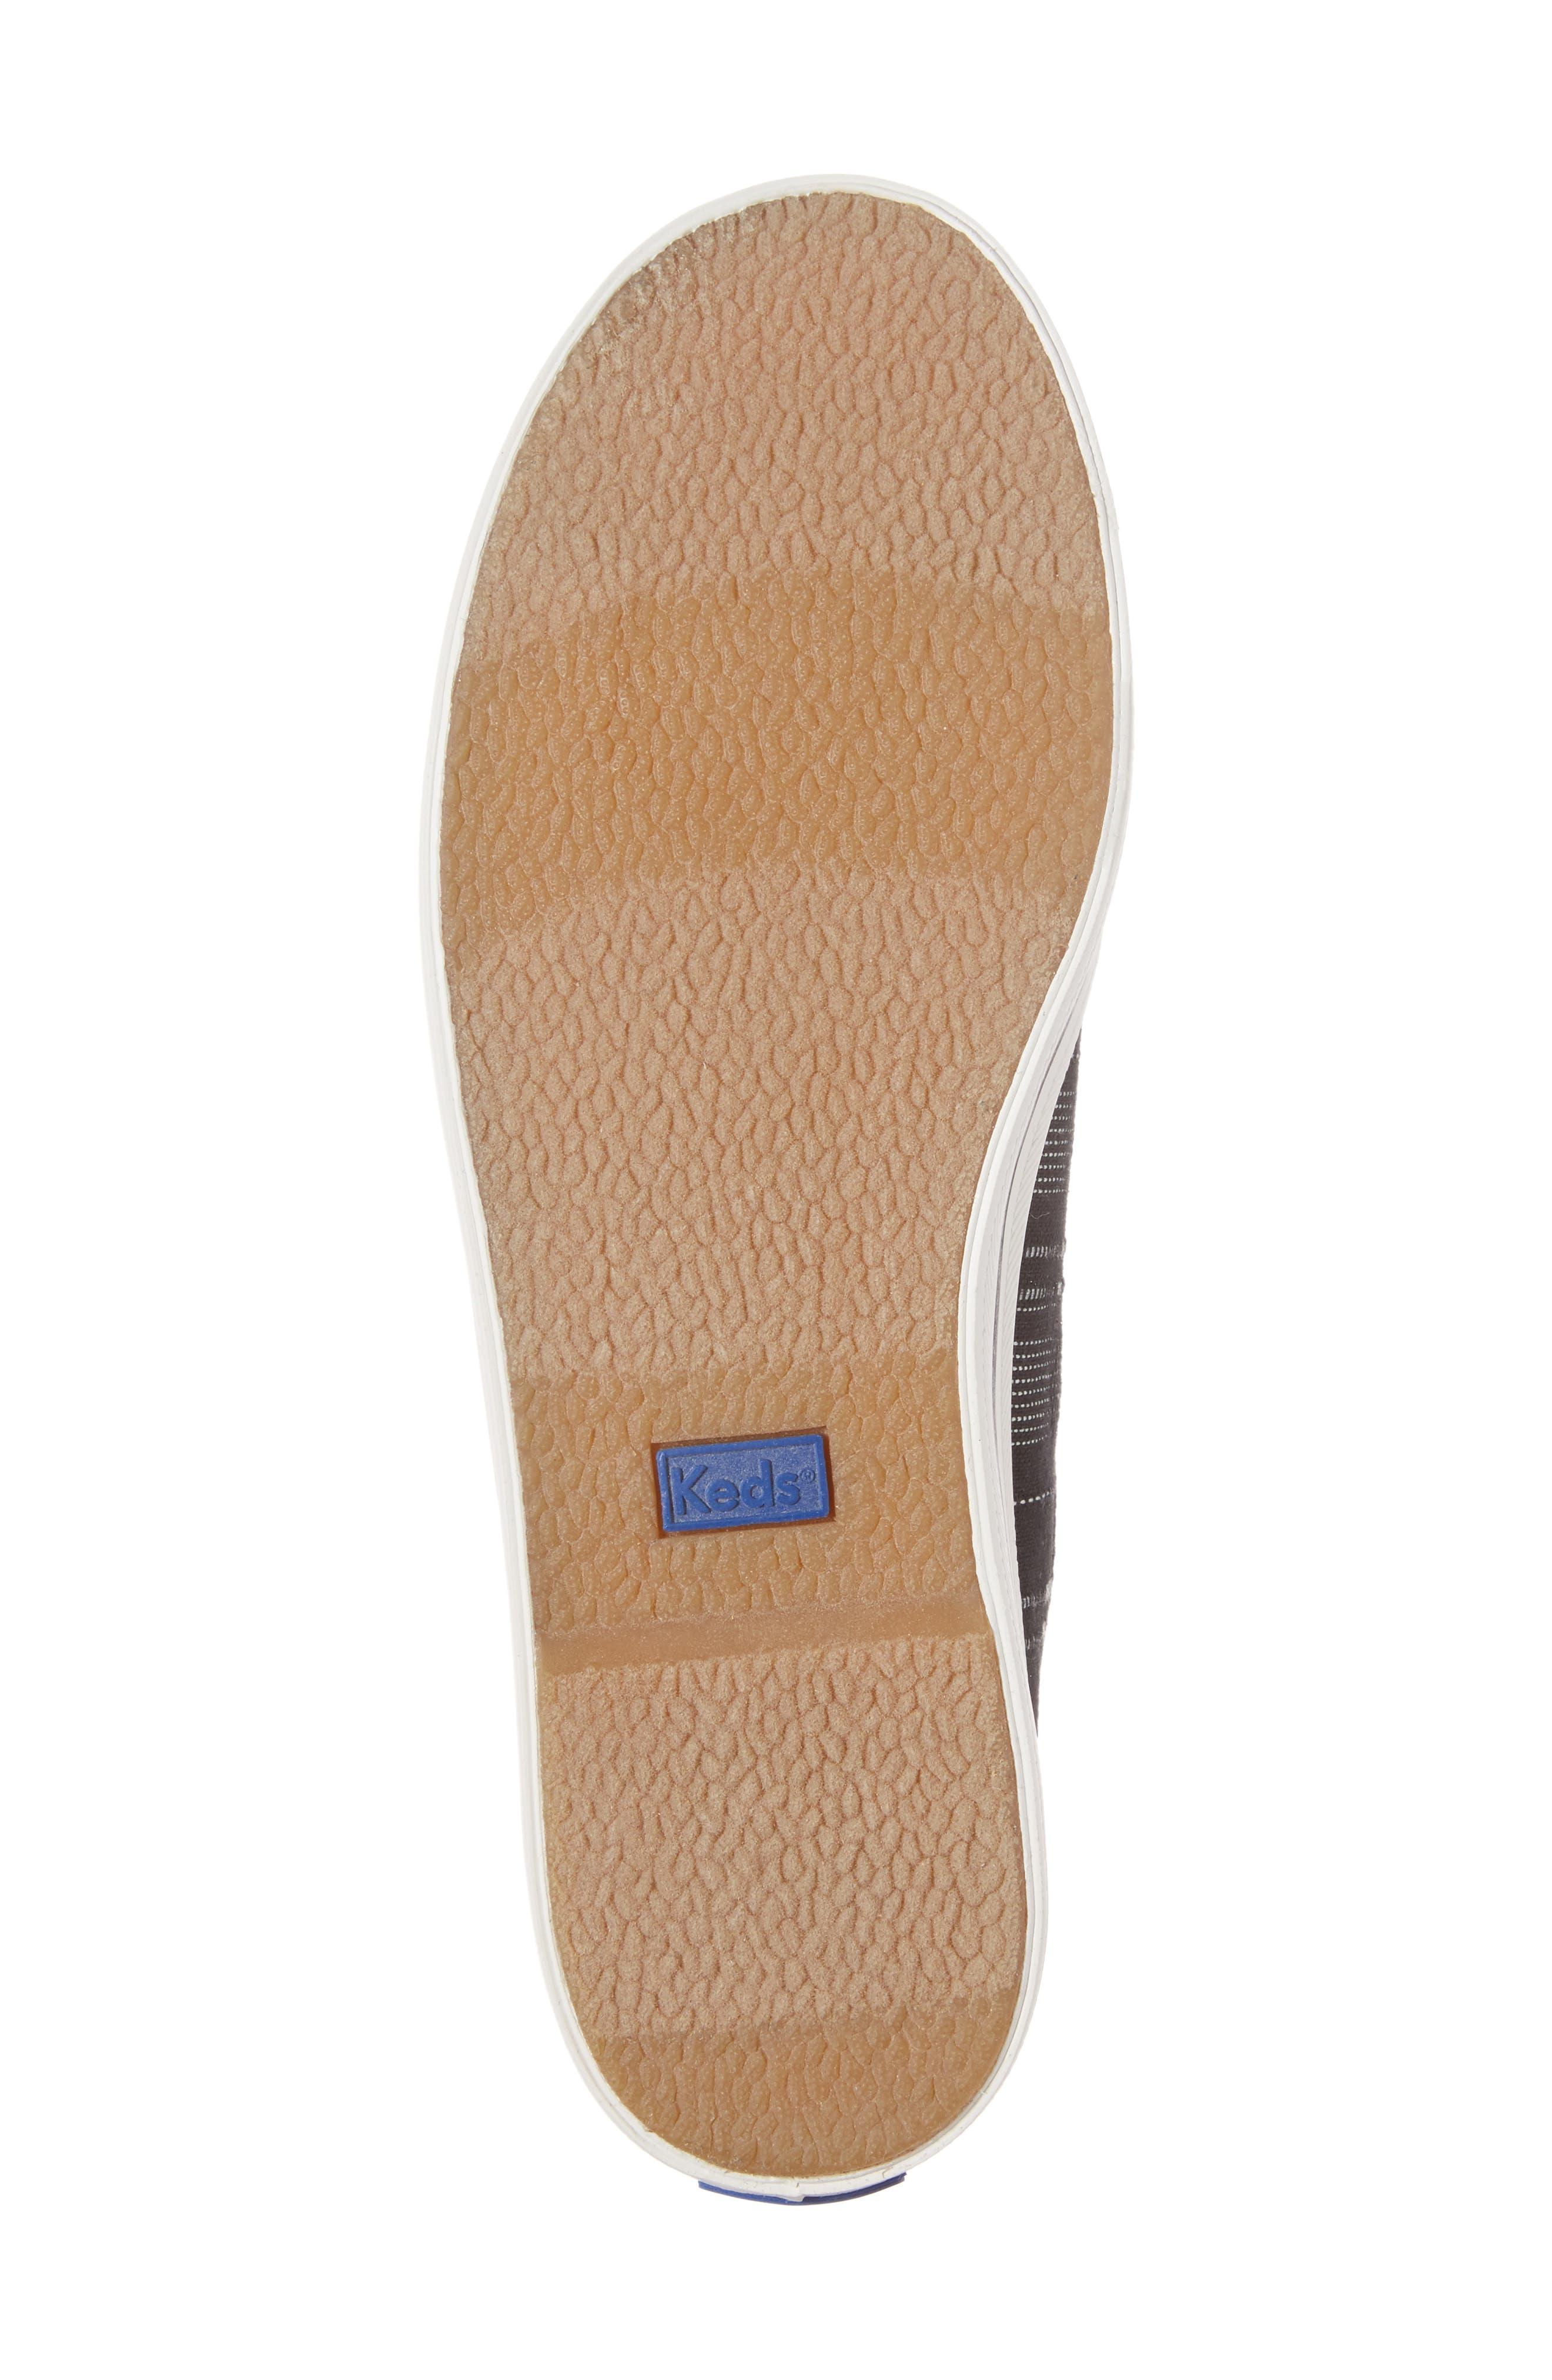 Kickstart Baja Stripe Sneaker,                             Alternate thumbnail 6, color,                             001